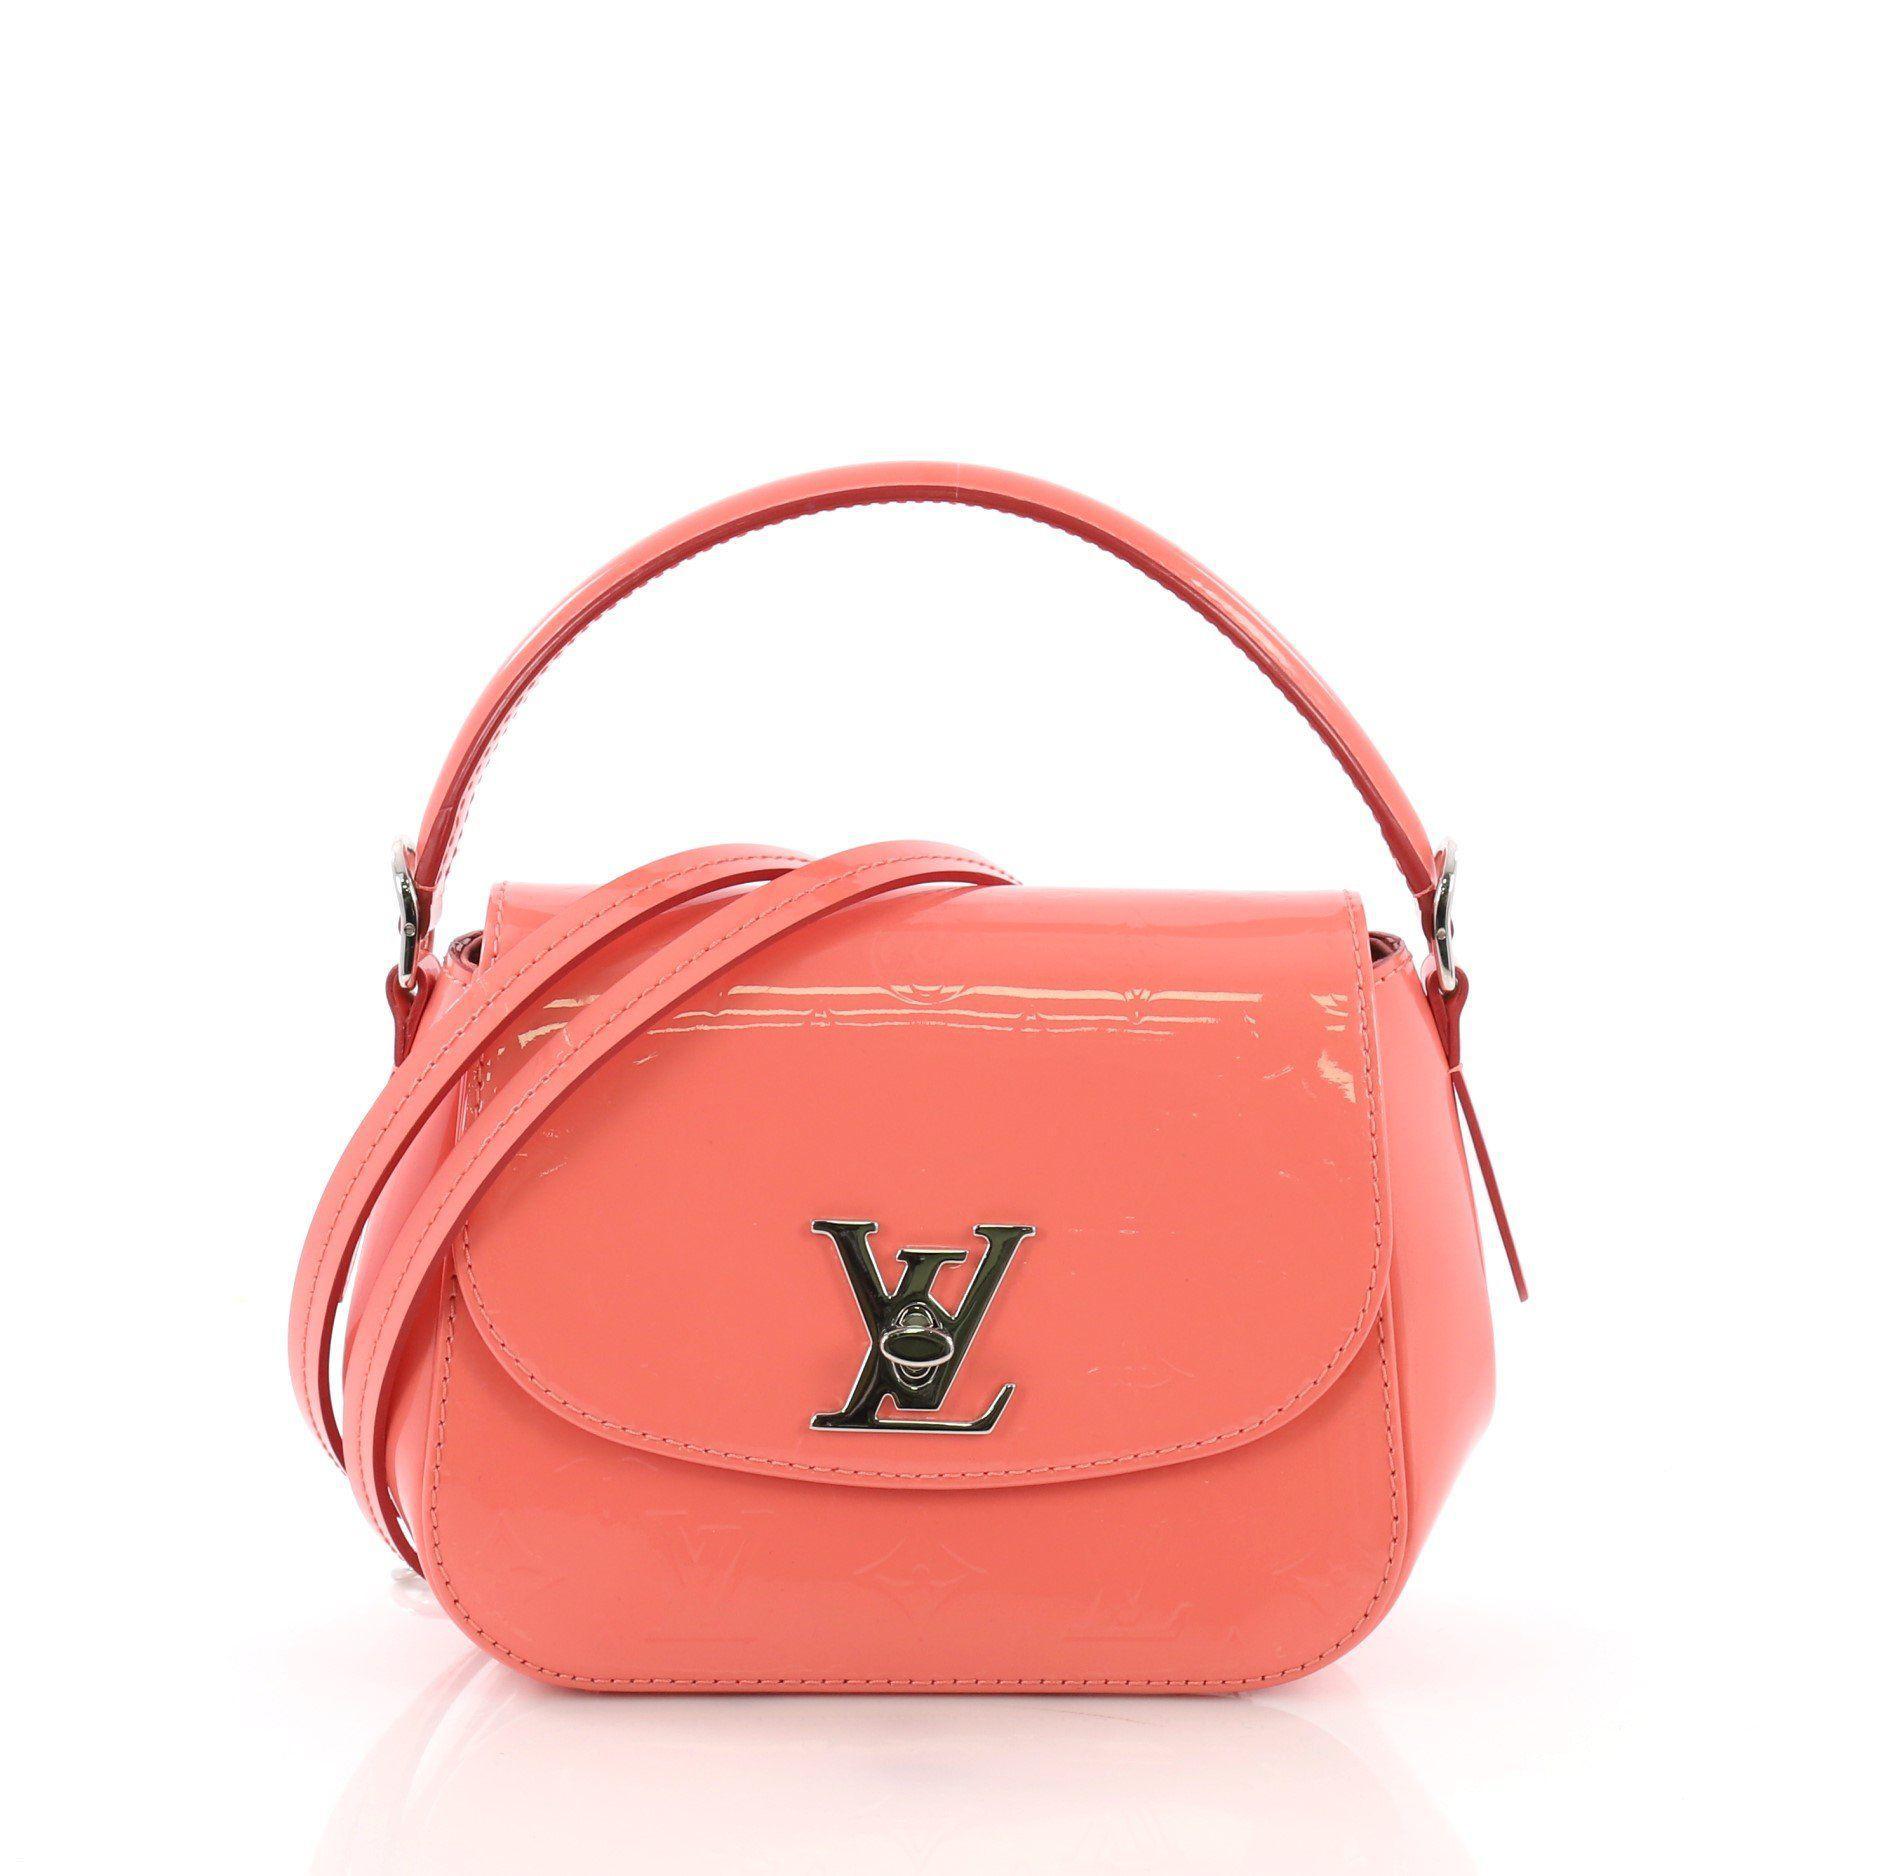 28ce73639216 Lyst - Louis Vuitton Pre Owned Pasadena Handbag Monogram Vernis in Pink